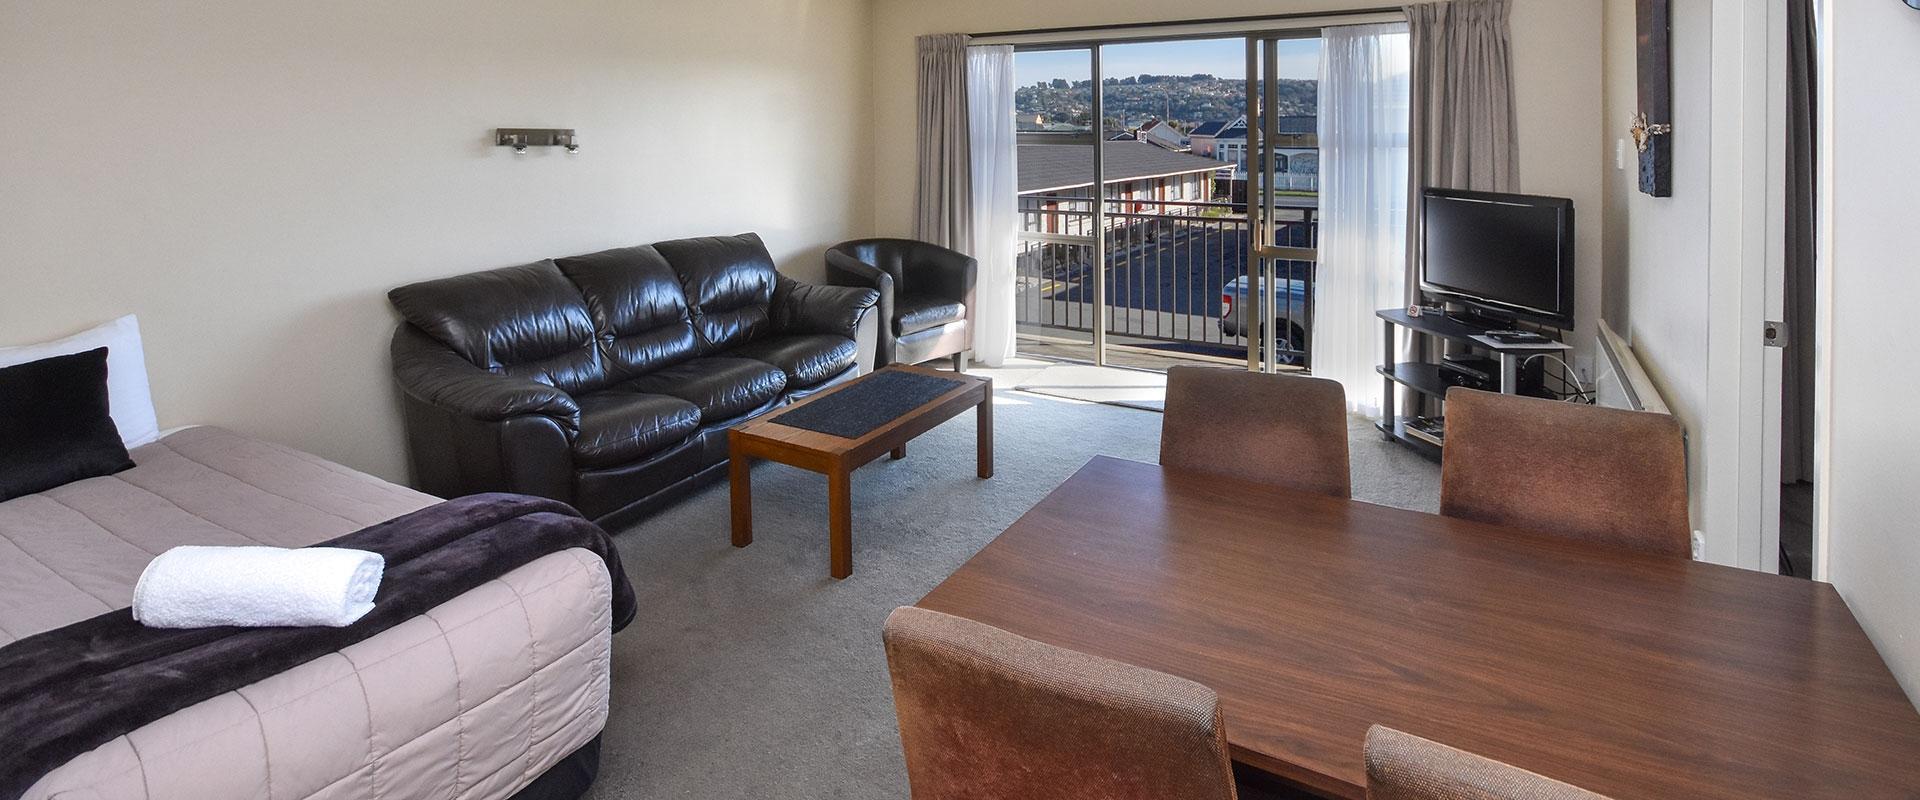 Dunedin motel